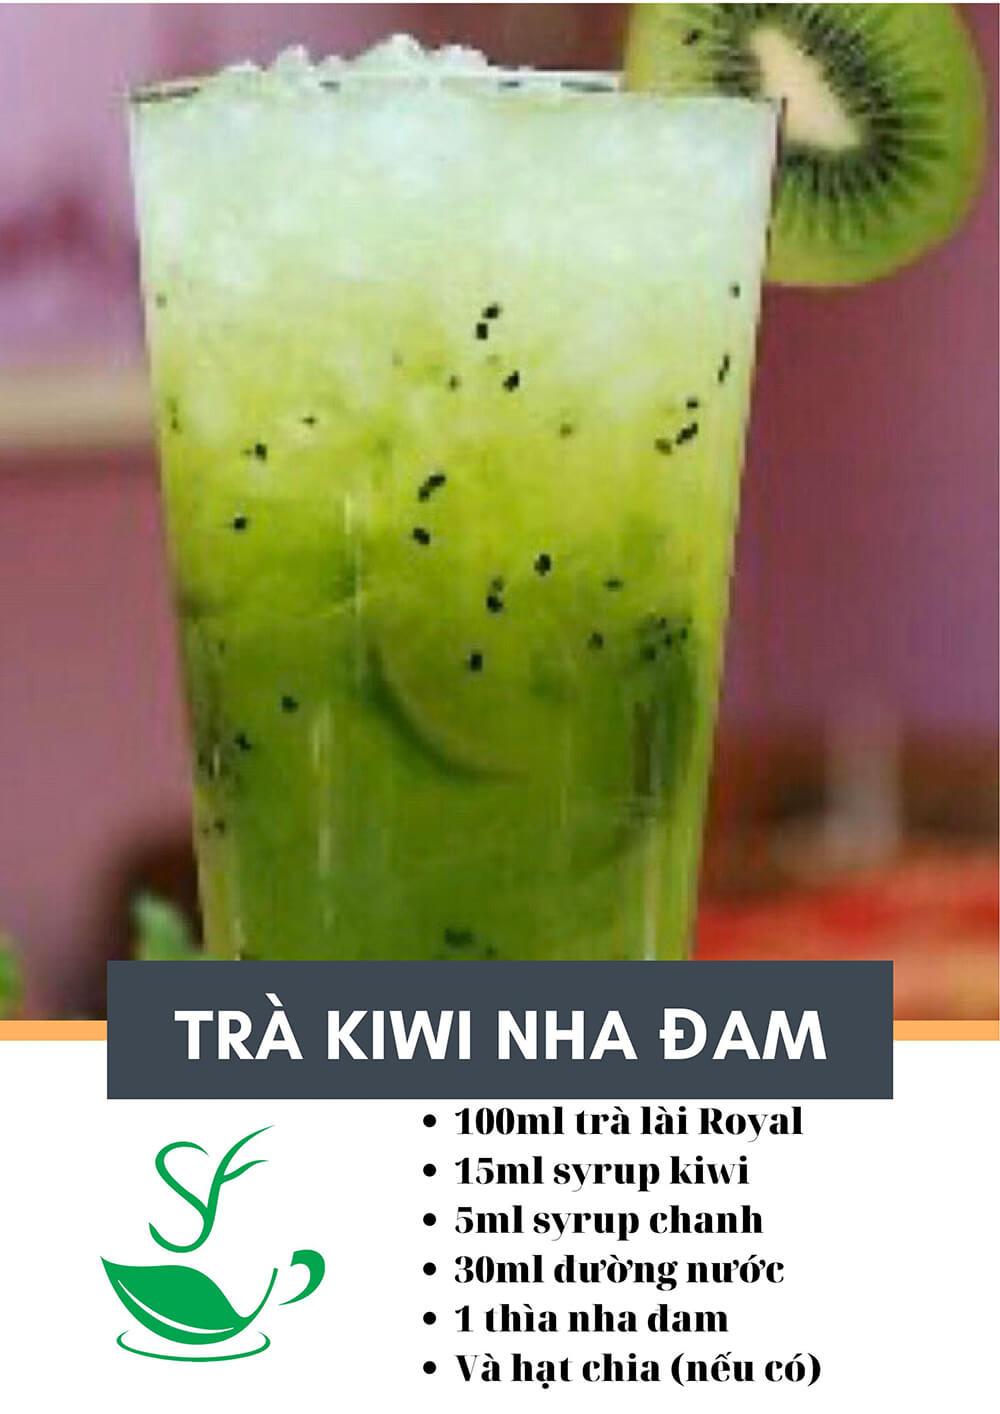 tra-kiwi-nha-dam